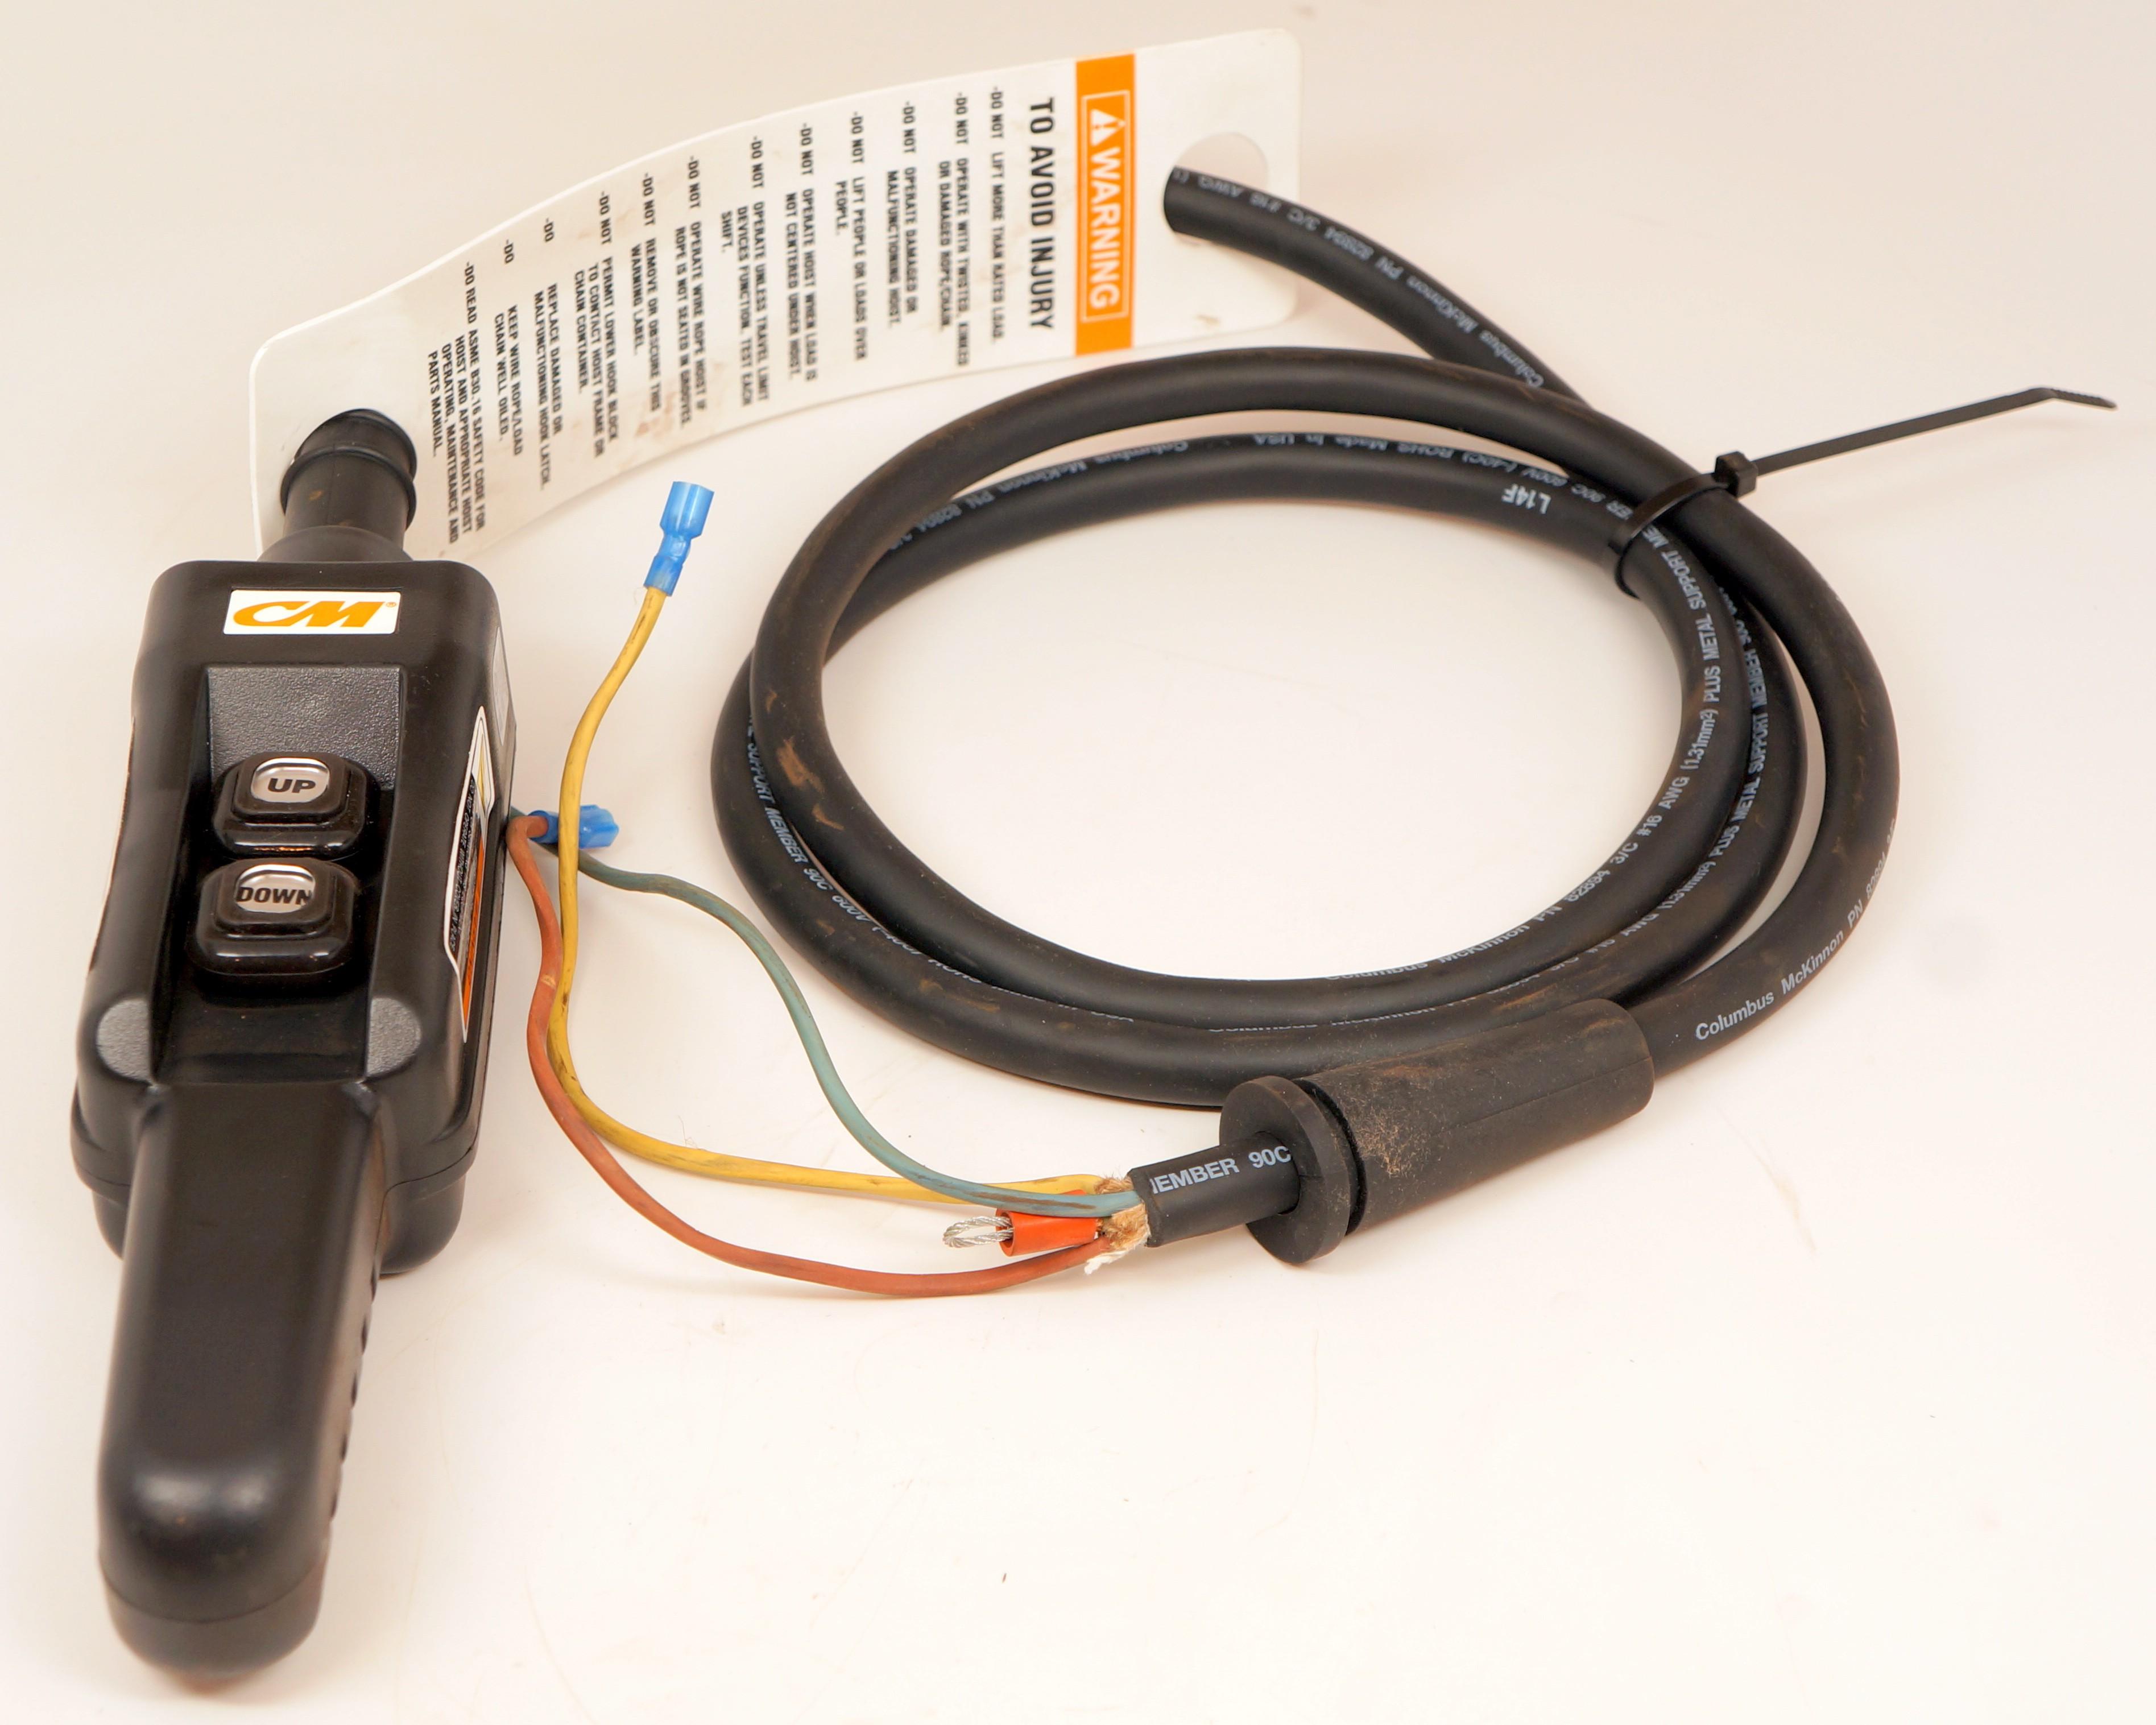 29333 cm pendant control station 2 button single speed 6 foot 29333 cm pendant control station 2 button single speed 6 foot cord aloadofball Choice Image